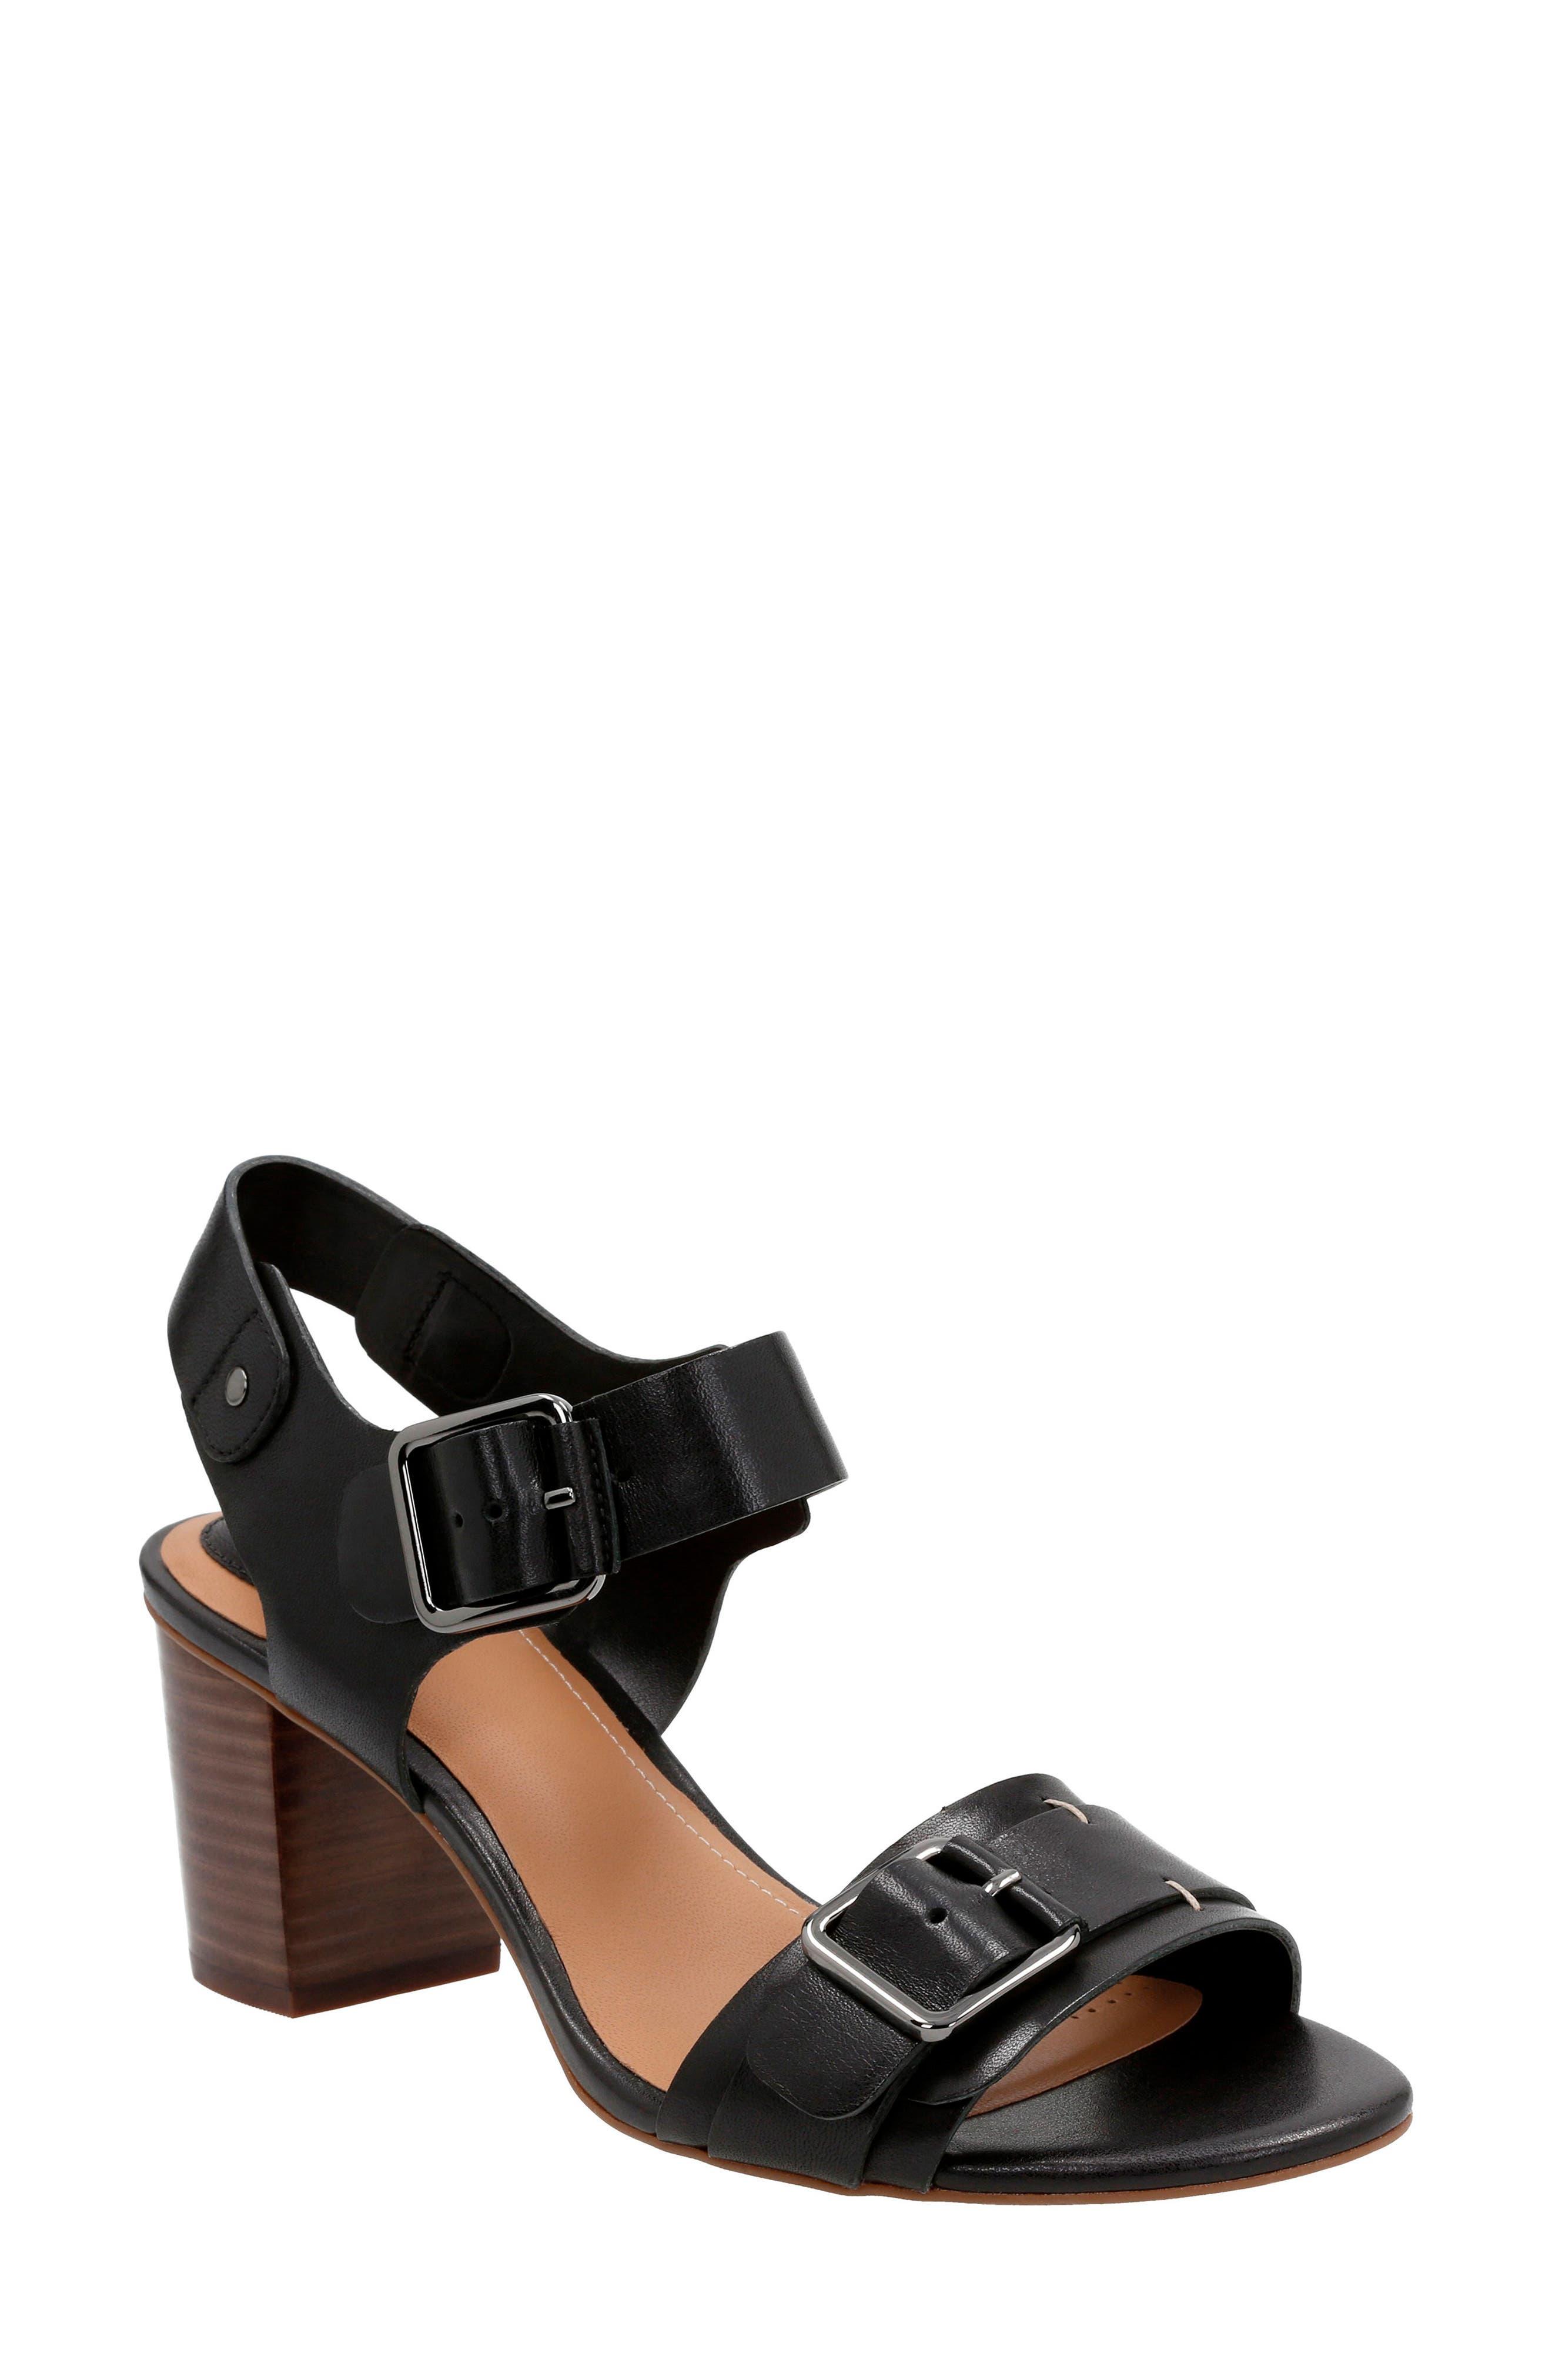 Ralene Dazzle Sandal,                             Main thumbnail 1, color,                             Black Leather